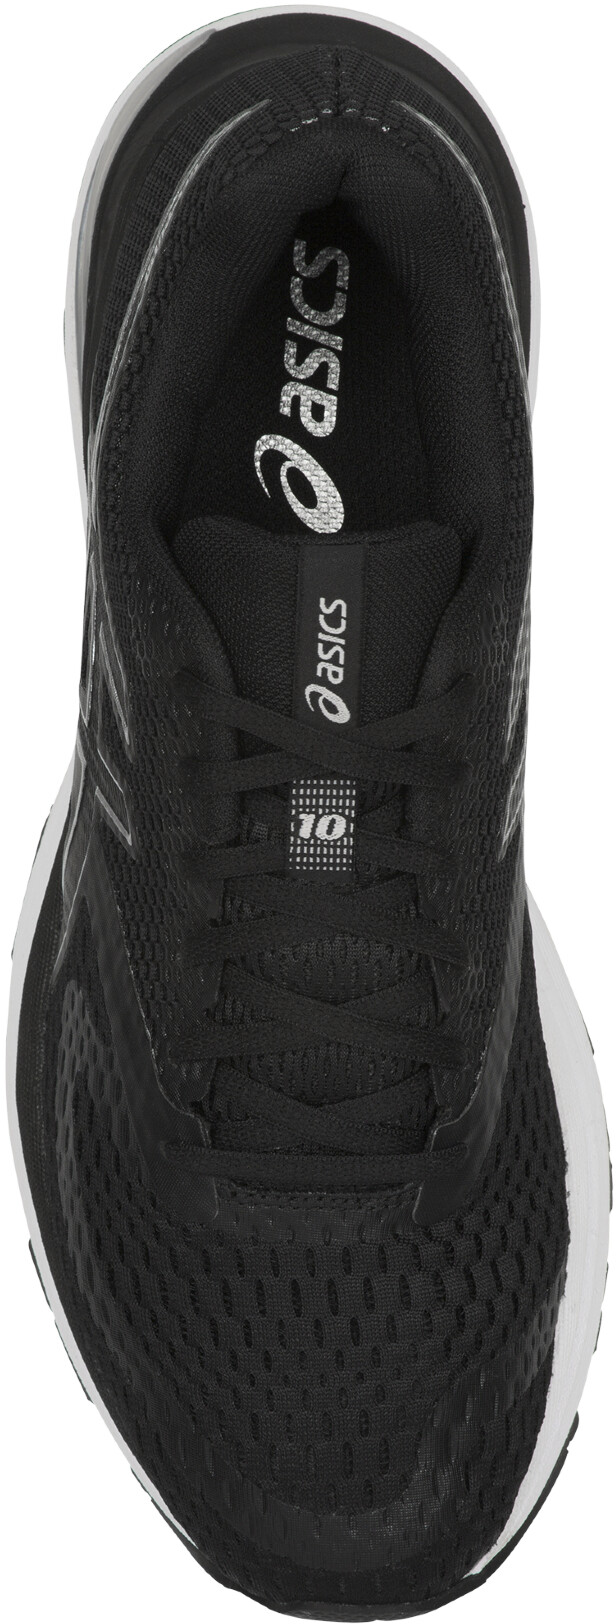 10 Pulse Gel Herren Shoes Asics Blacksilver Fcu1TlKJ3